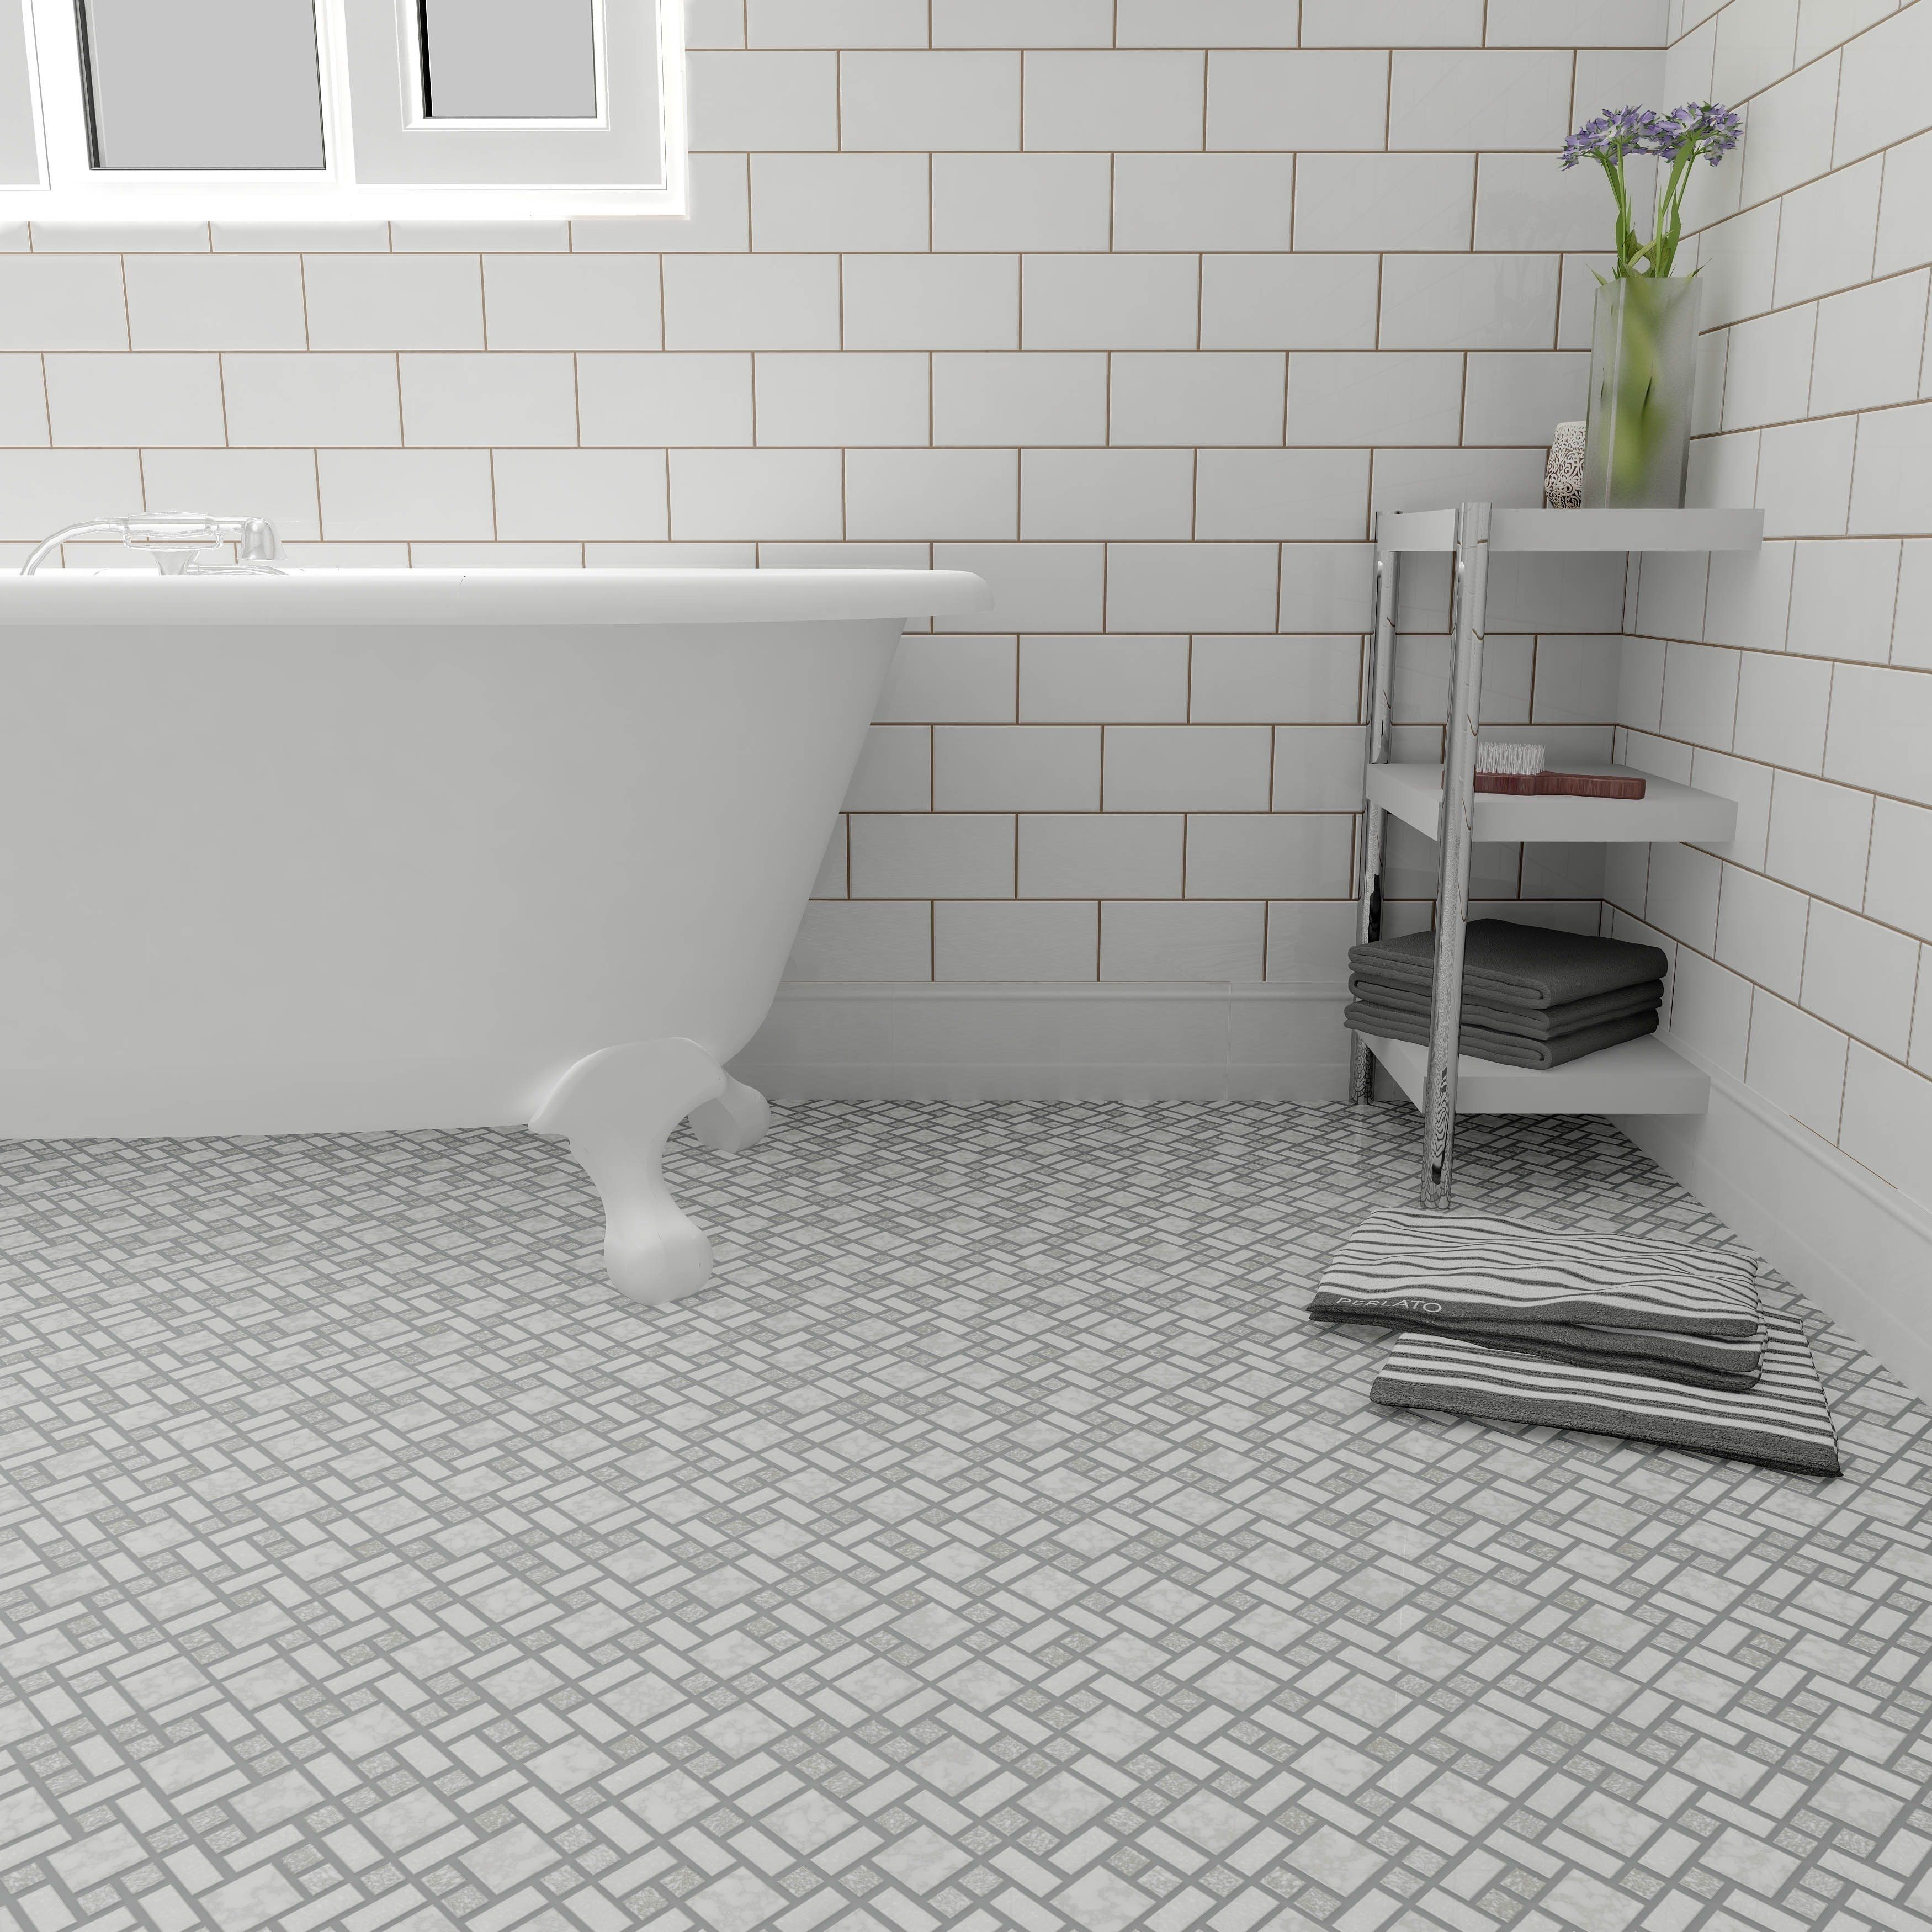 Subway Tile With Mosaic Floor Porcelain Mosaic Porcelain Mosaic Tile Ceramic Floor Tile